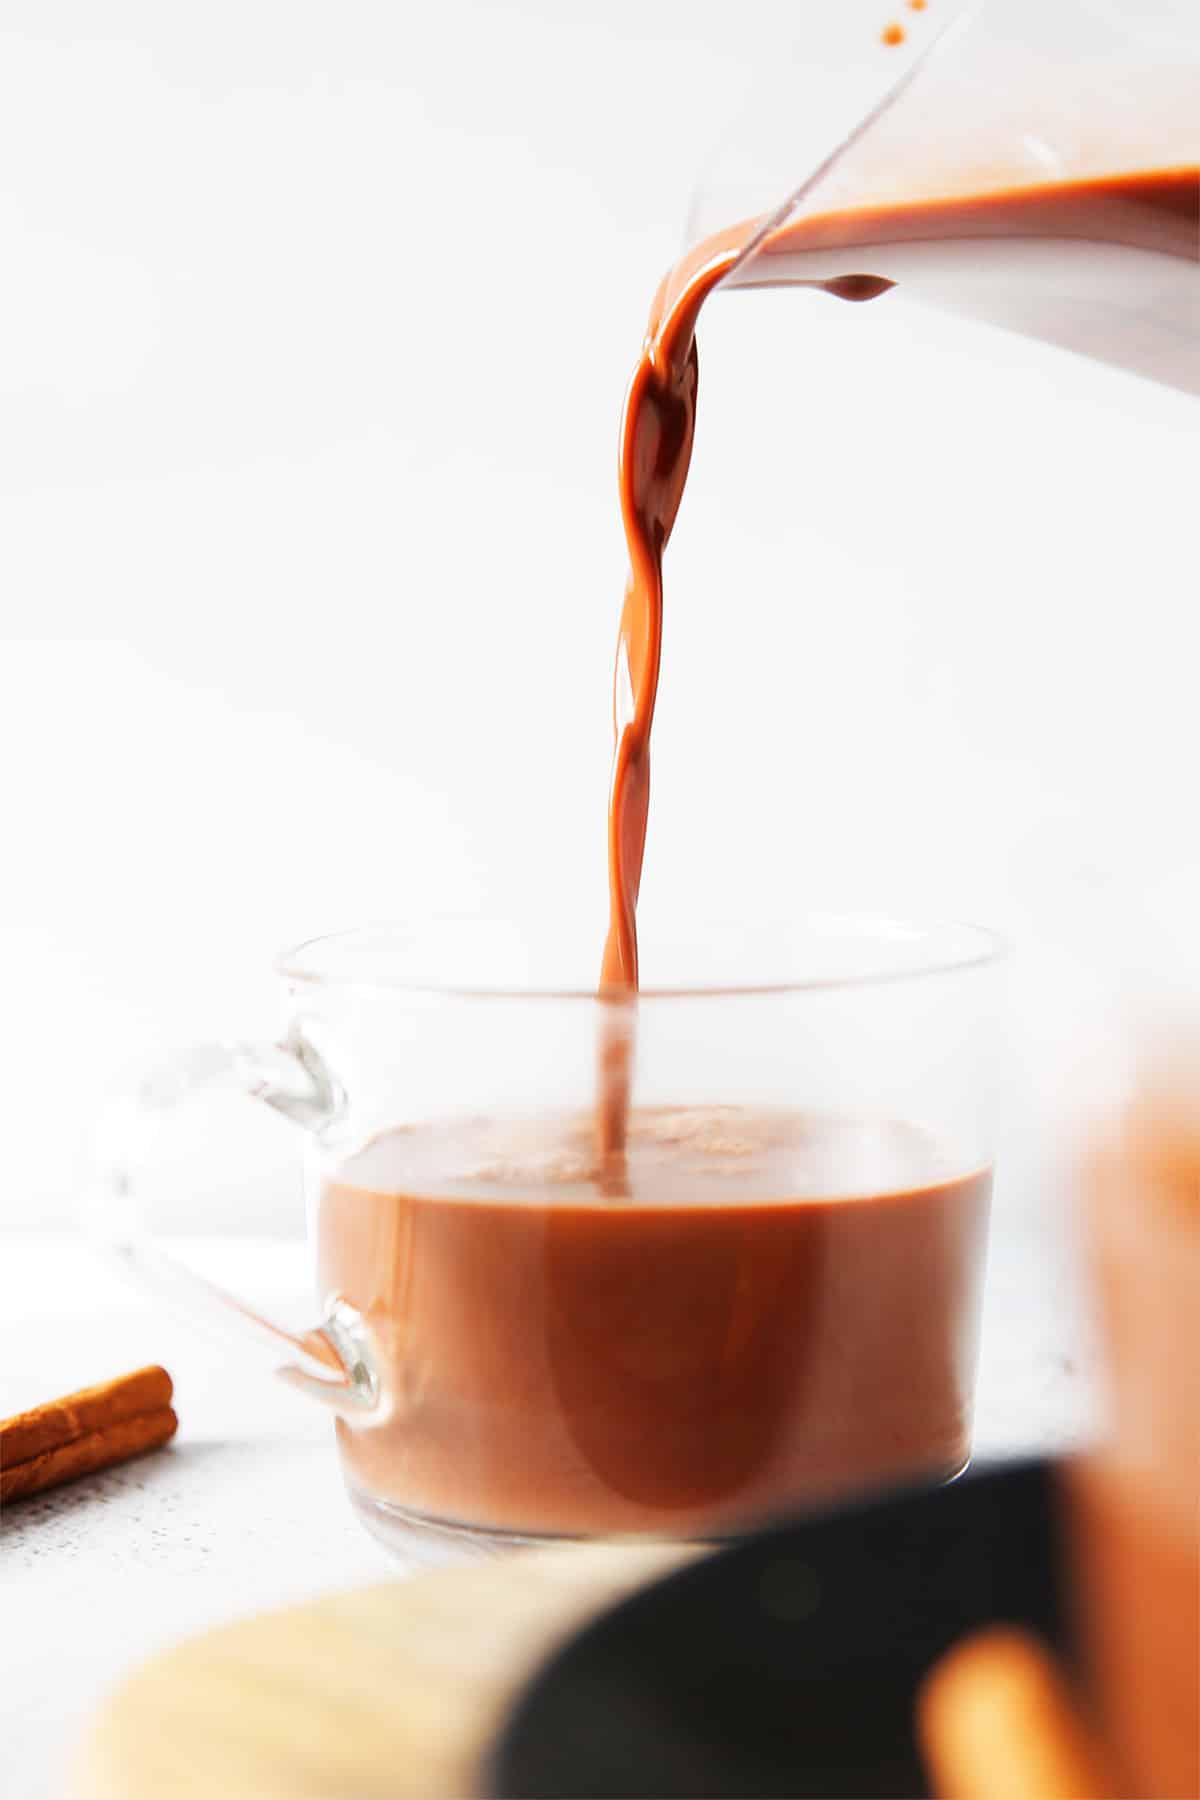 pouring vegan hot chocolate in a mug